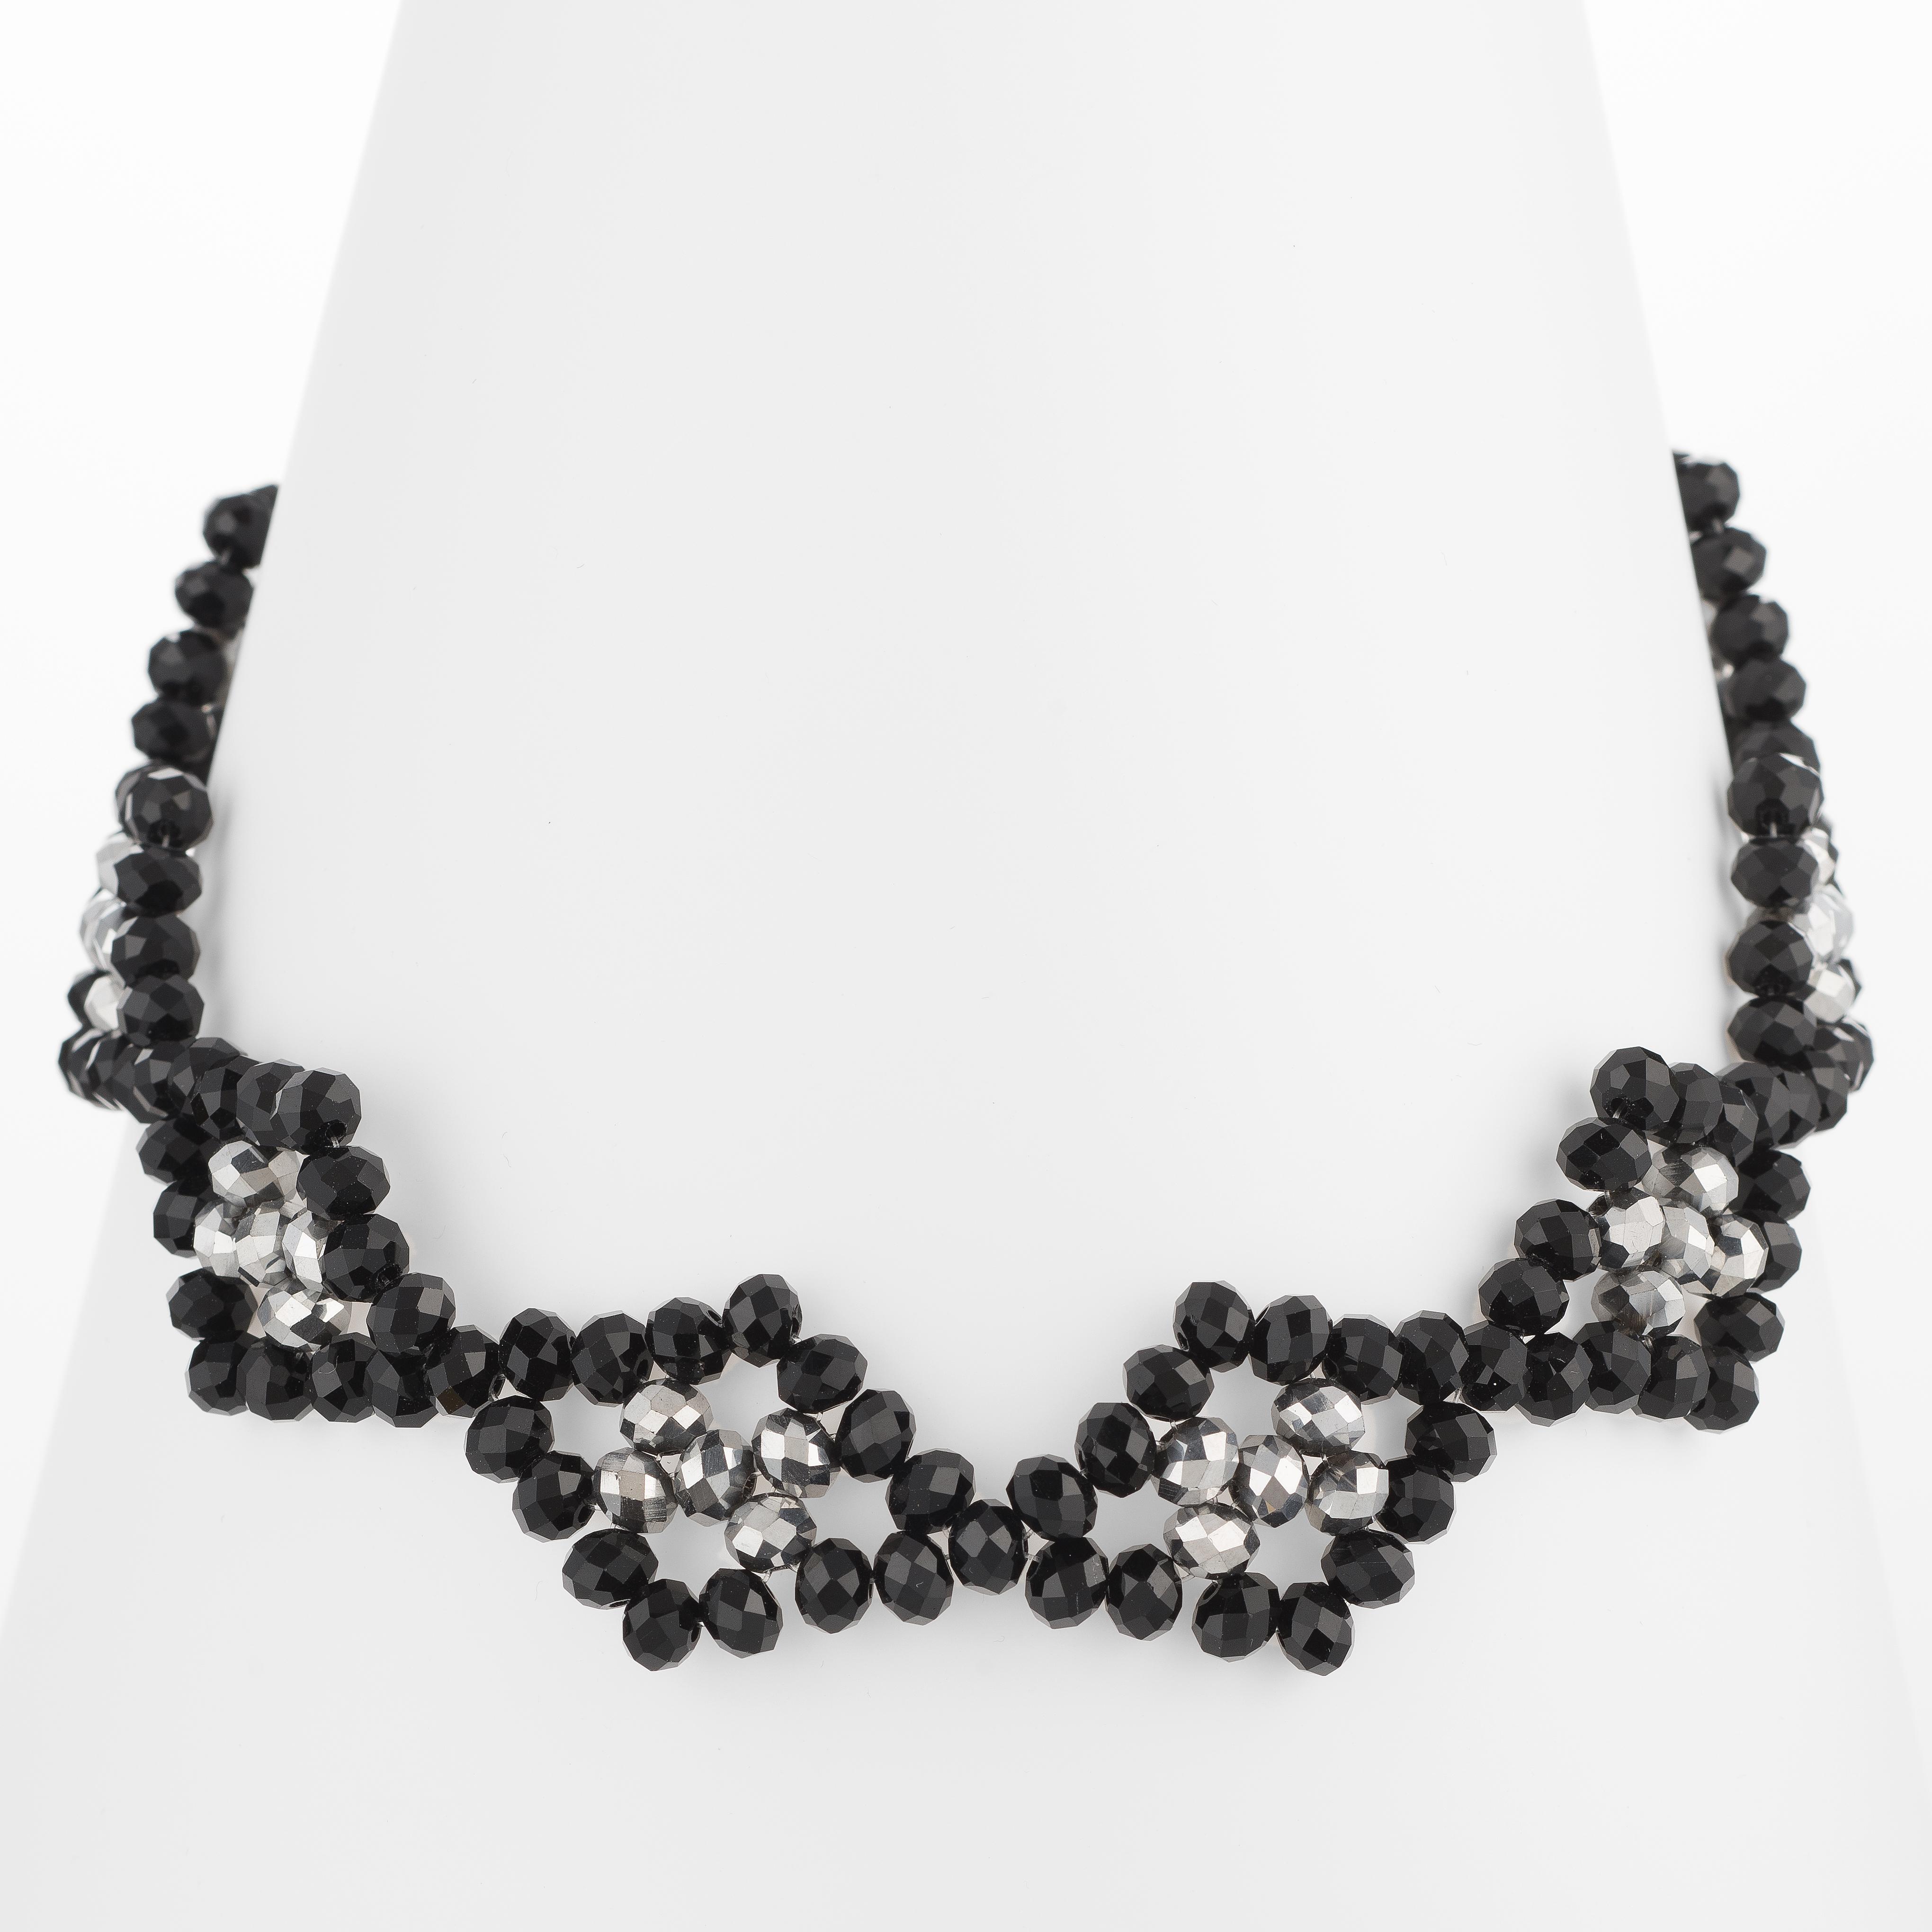 Handmade Diamond Shape Black Onyx, Crystal, Seed Beads Adjustable Necklace, Jewelry For Women, Girls